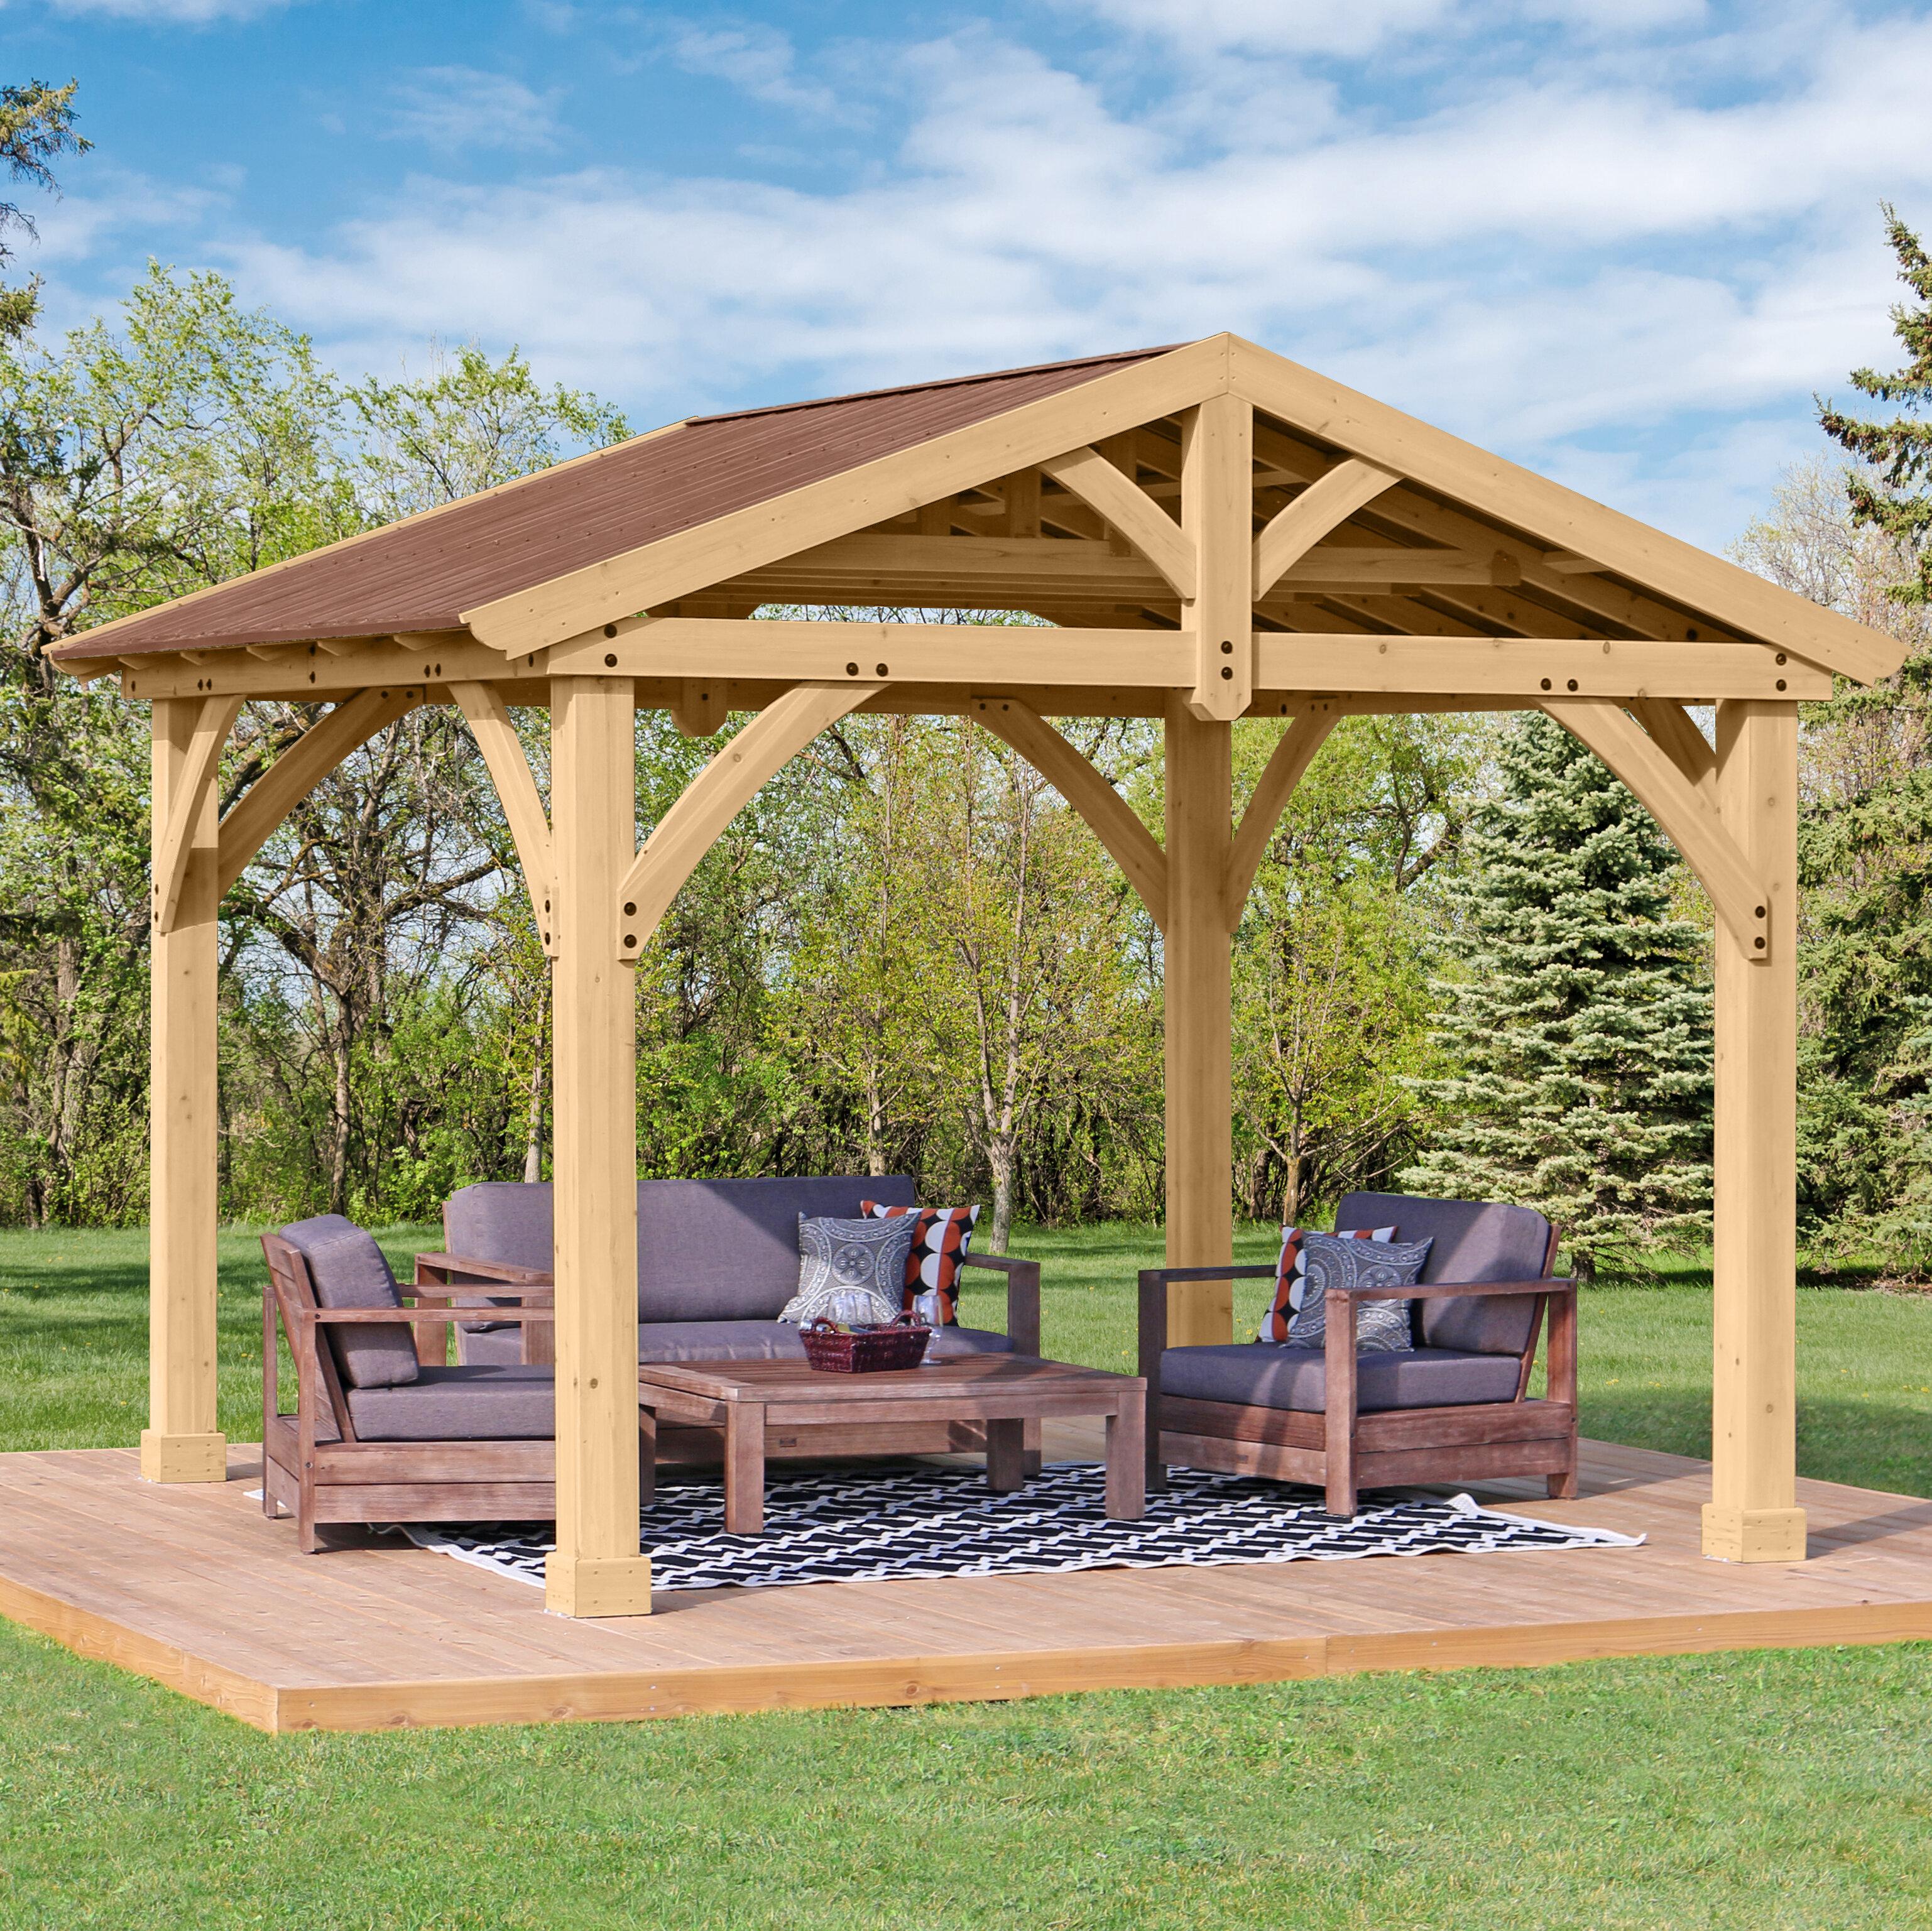 prefab bar design pictures img furniture wooden diy building patio ideas step steps wood designs